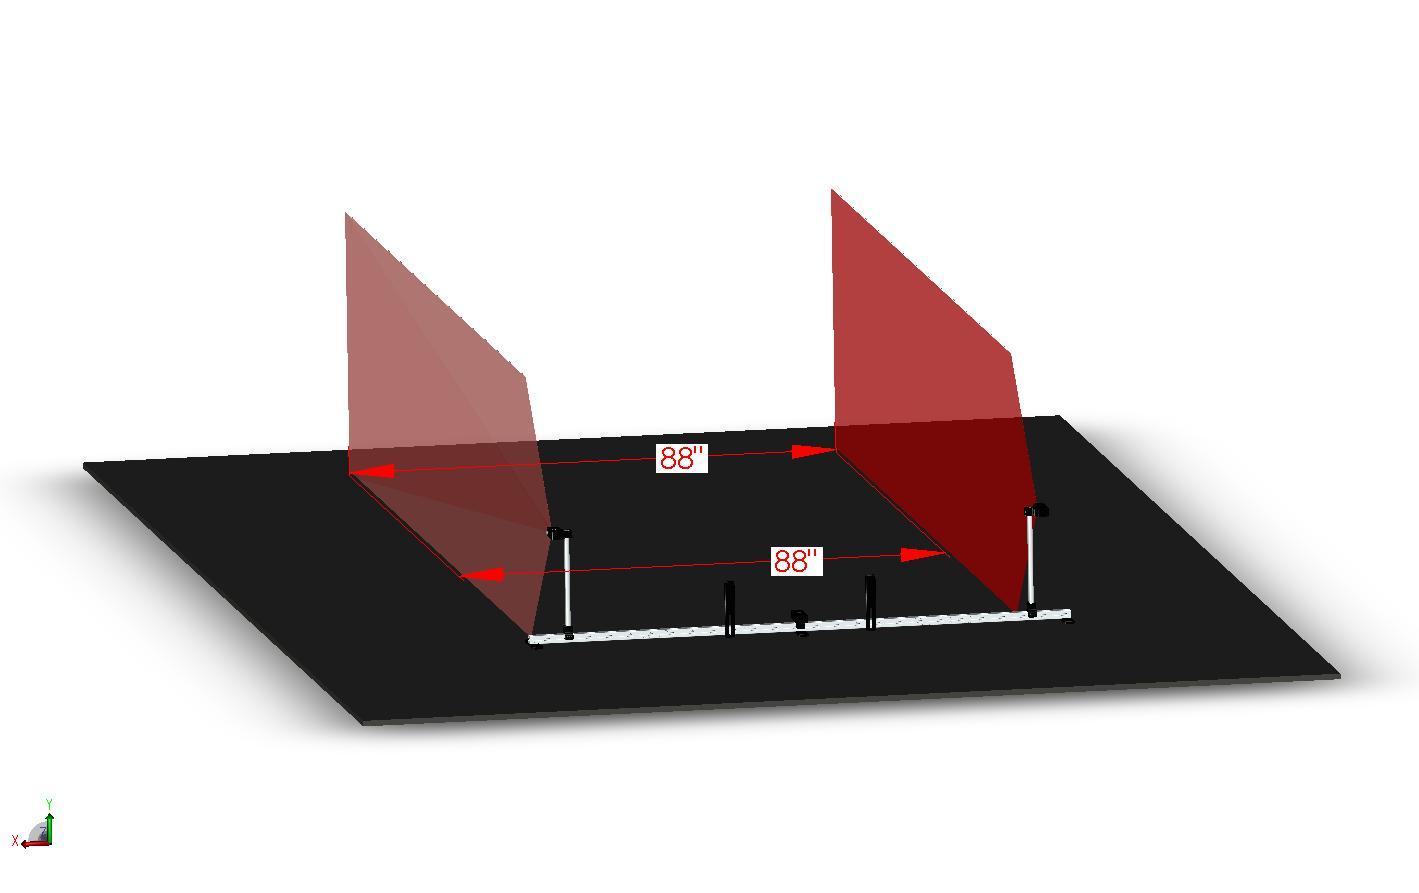 laser-alignment-diagram-8-10.jpg